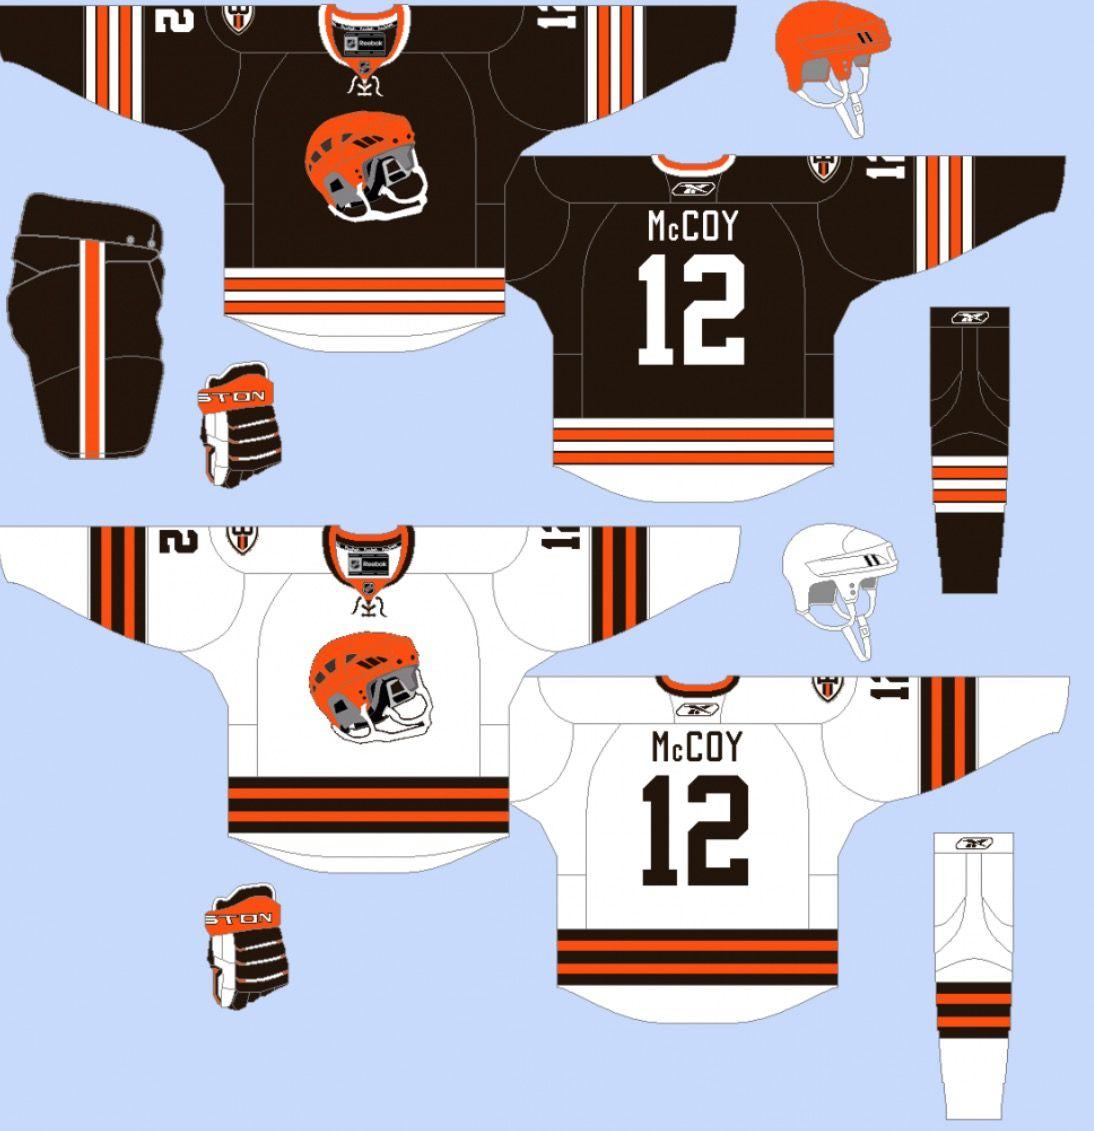 timeless design 1ec6e 08cad Cleveland Browns hockey sweater concept | Sport logos and ...